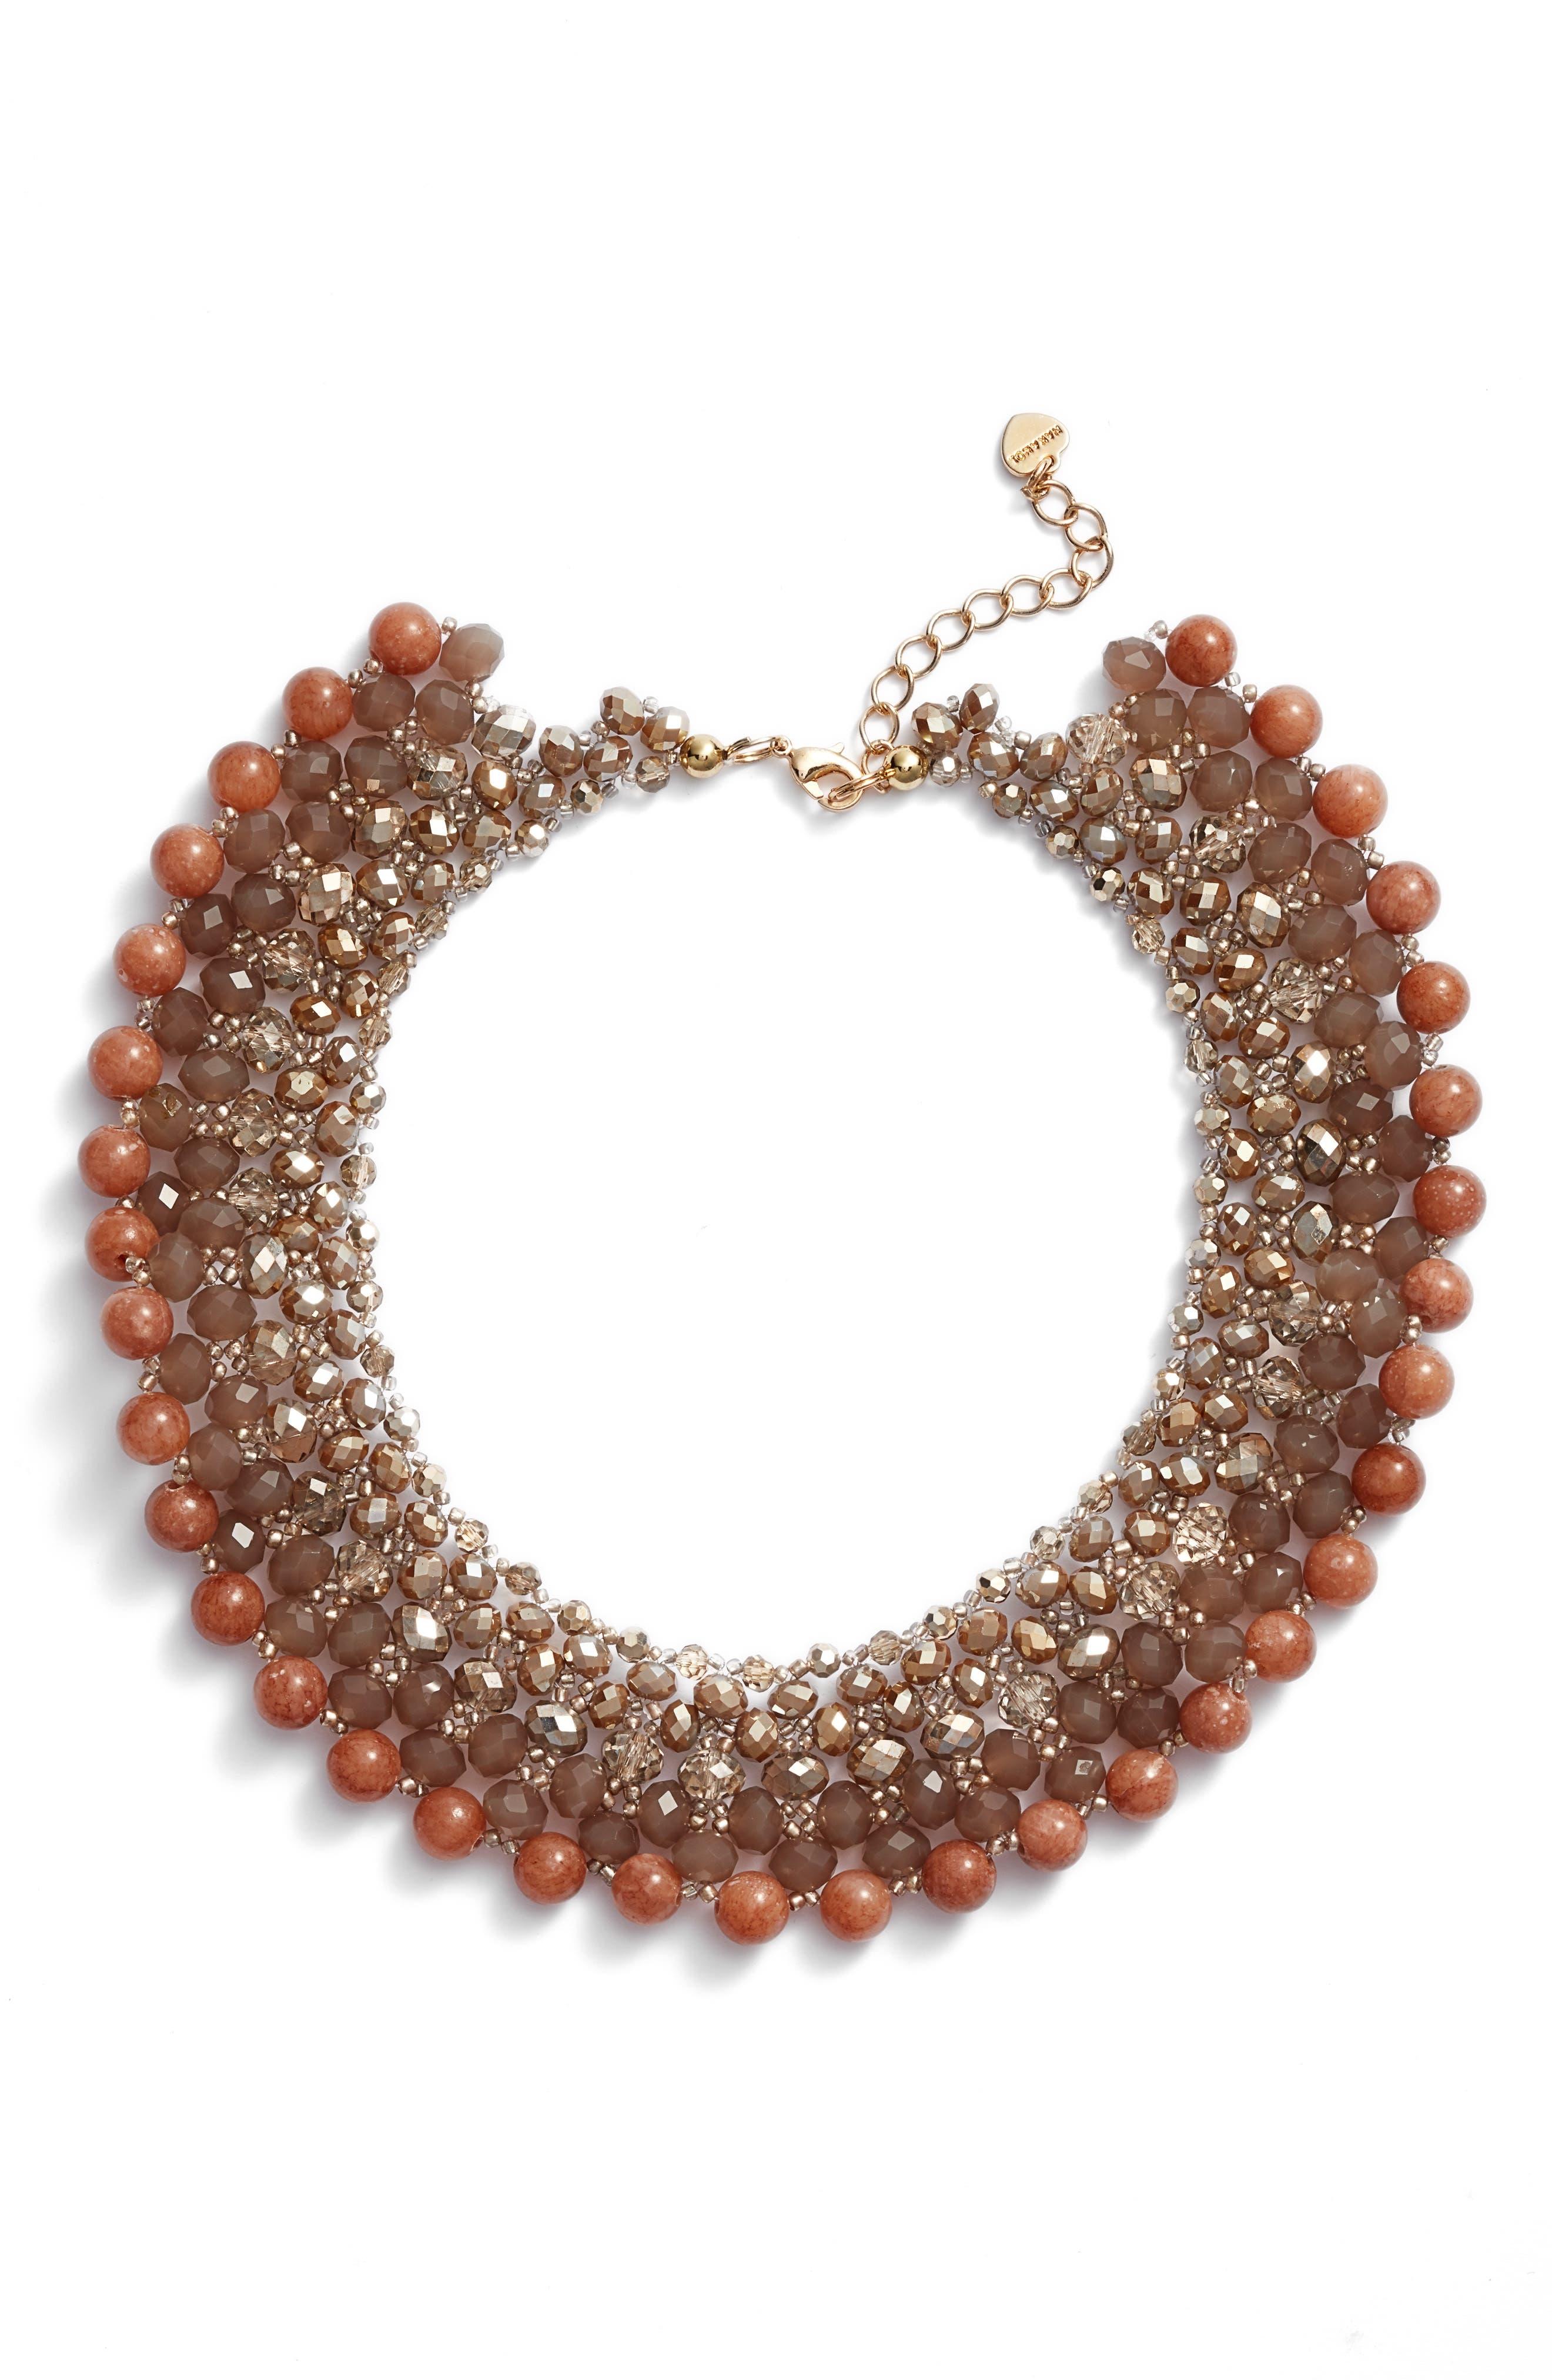 Main Image - Nakamol Design Crochet Stone Collar Necklace